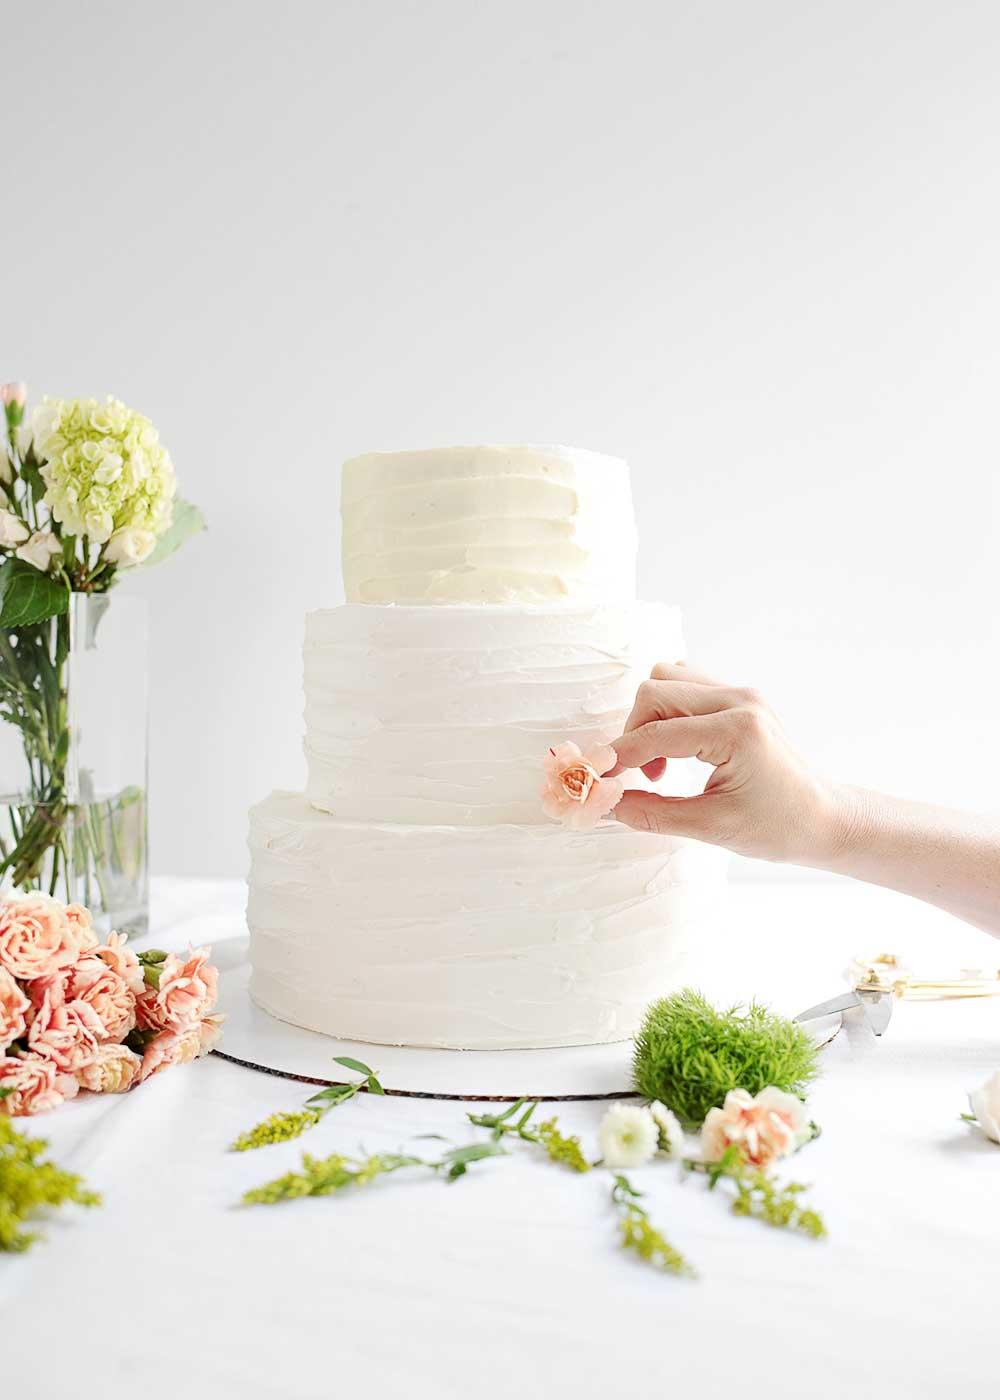 DIY Wedding Cake decorating from The Fauxmartha